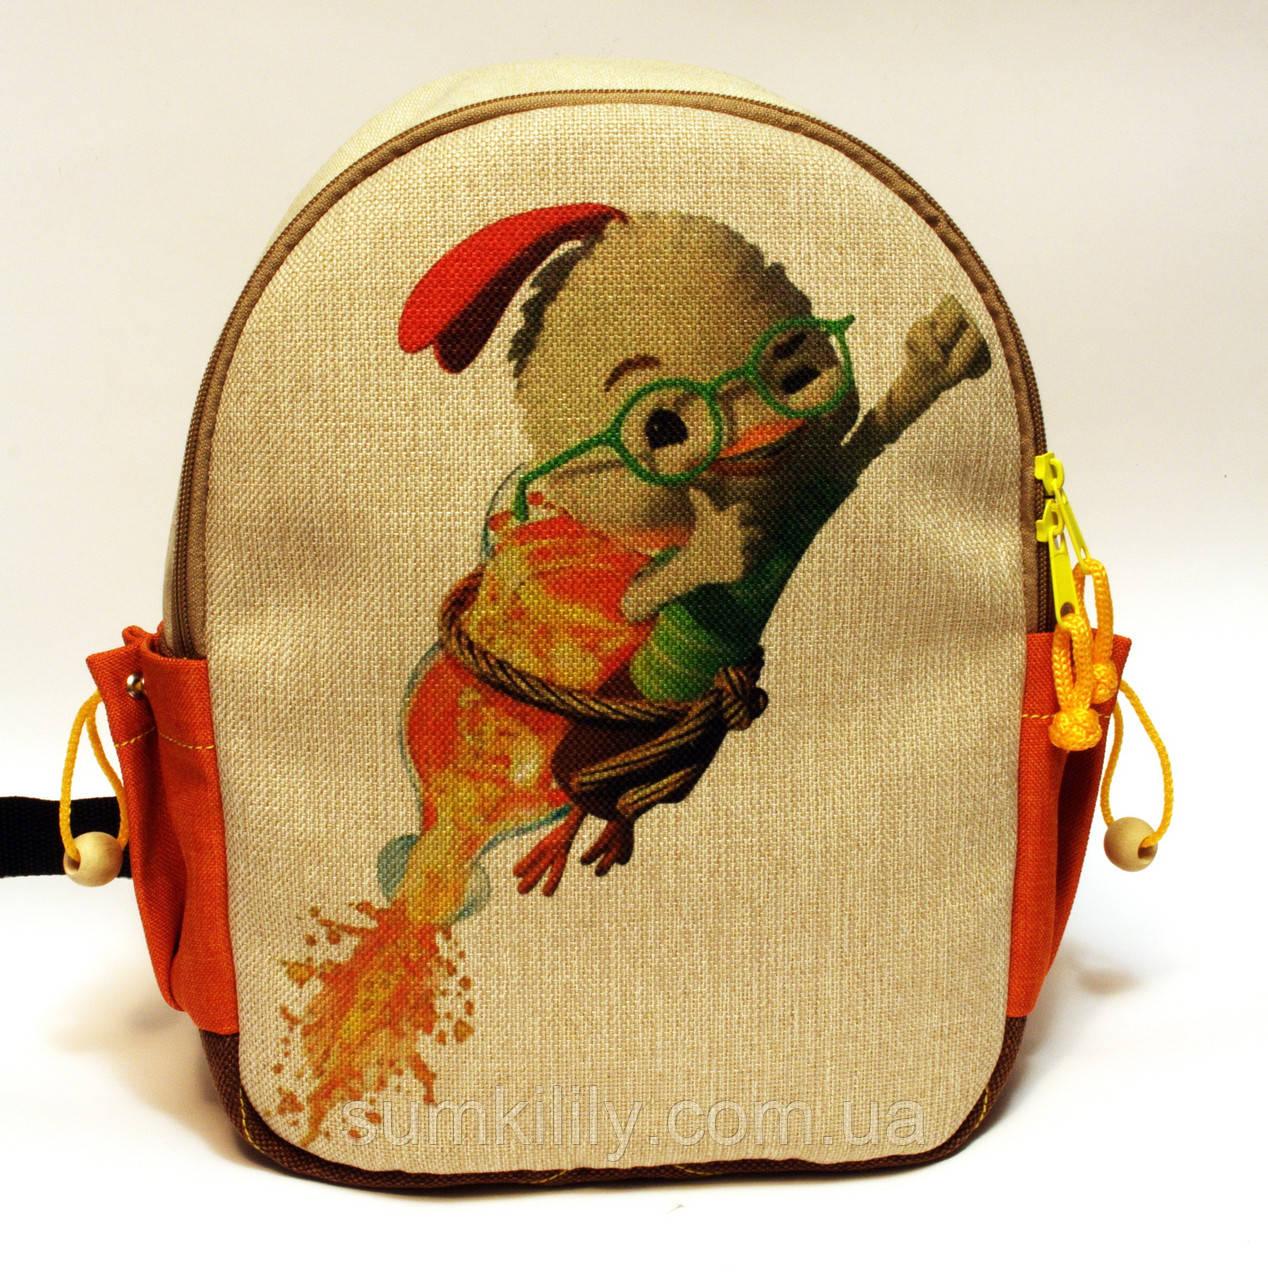 Детский рюкзак Цыпа, фото 1